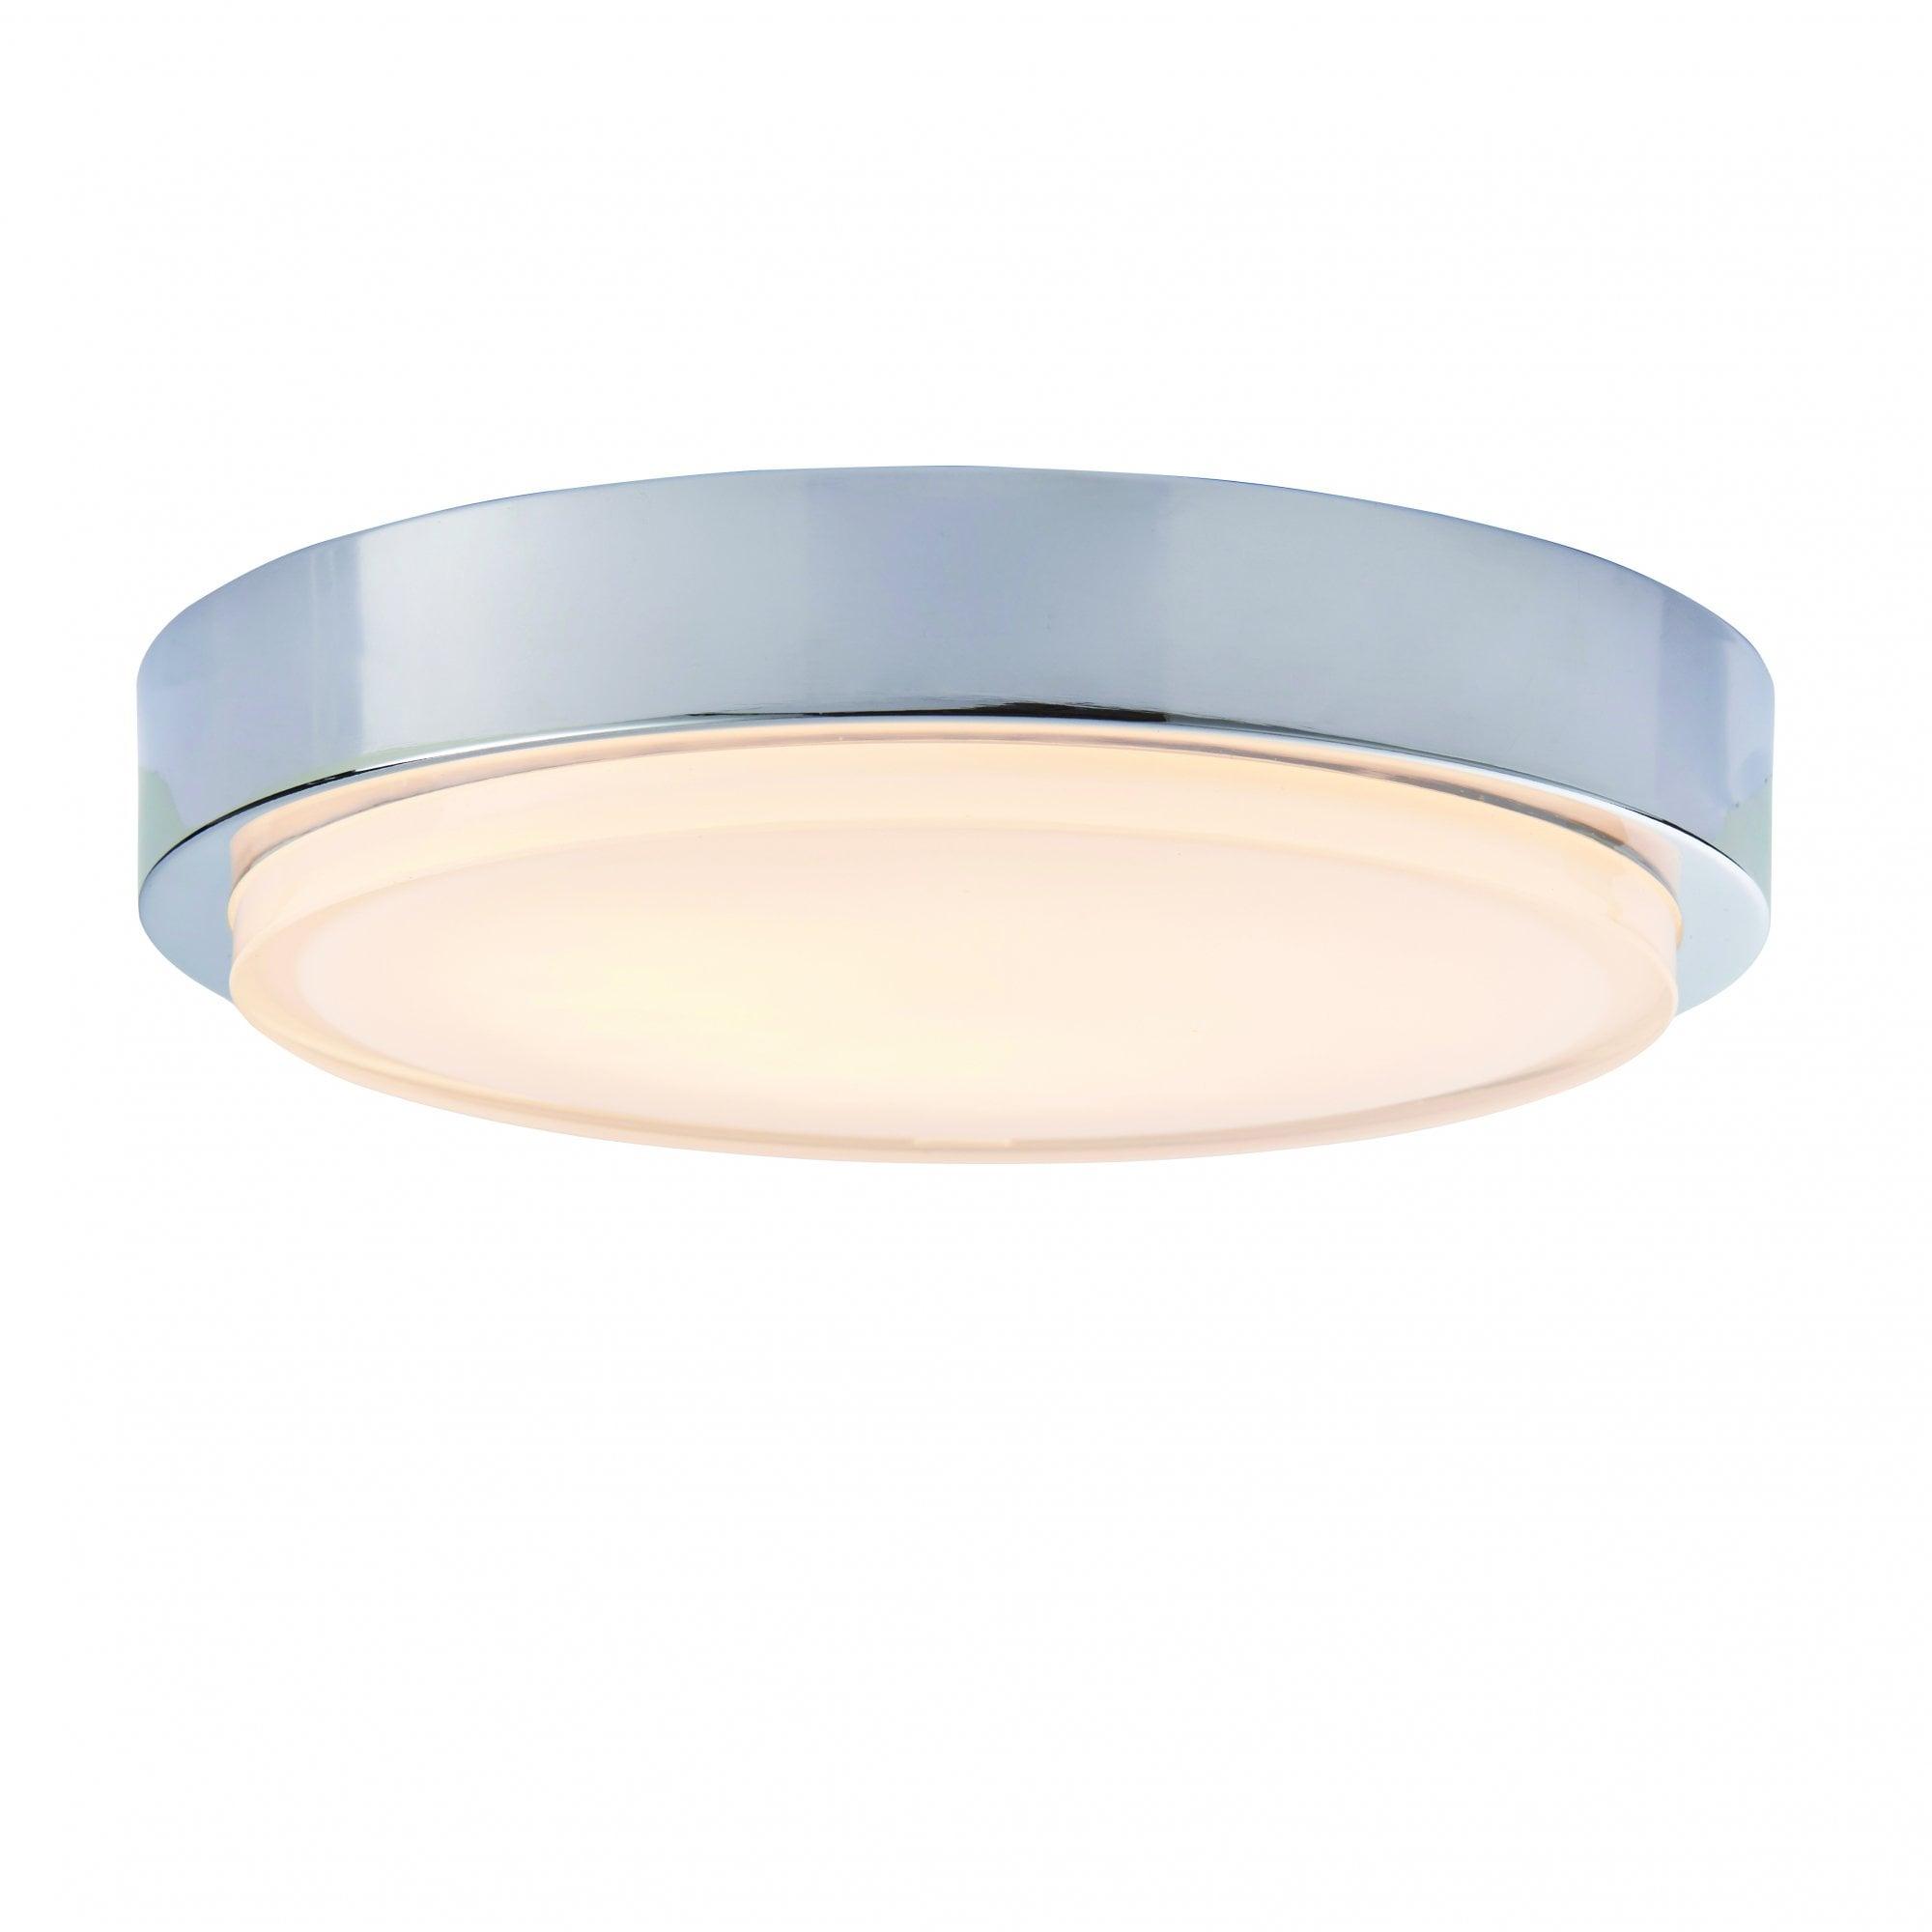 Chrome Flush Fit Led Bathroom Ceiling Light With White Glass